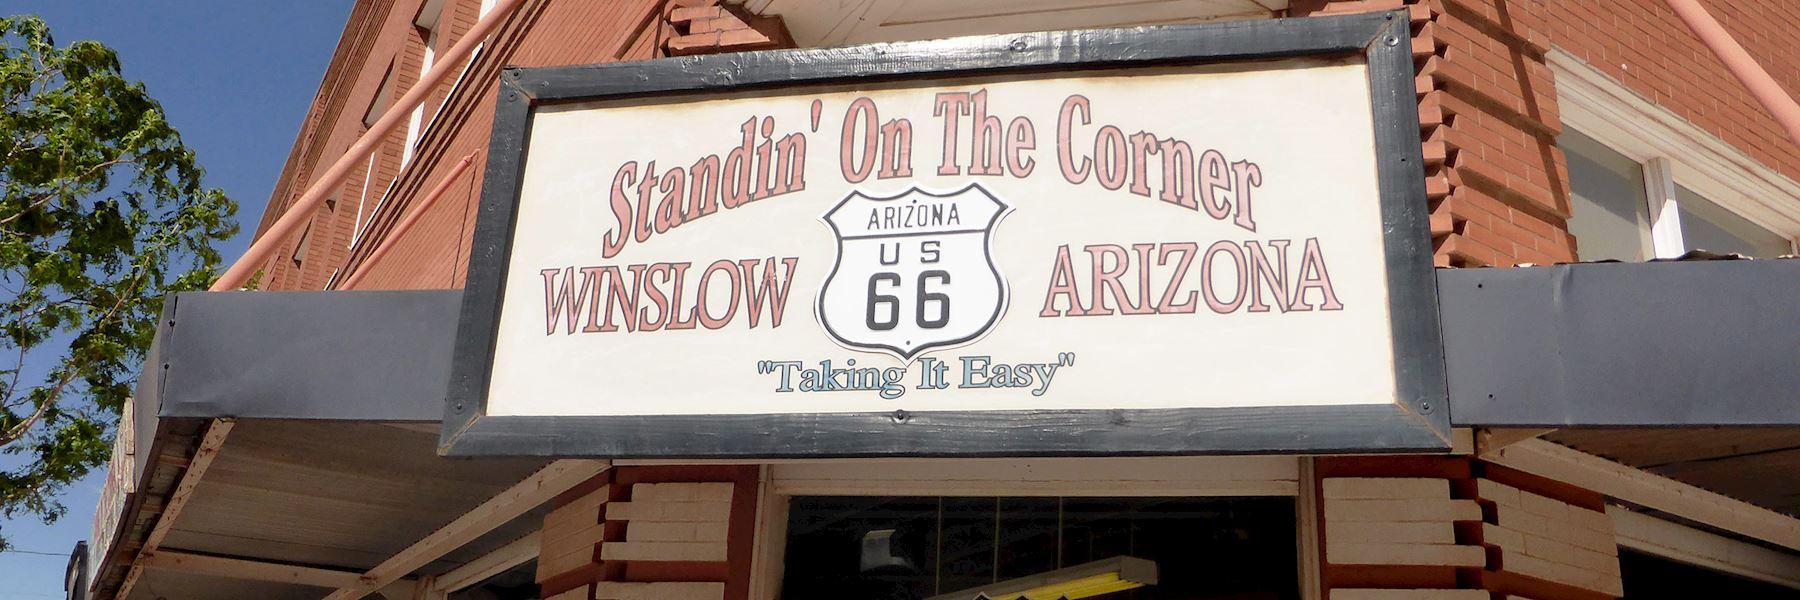 Visit Winslow, USA